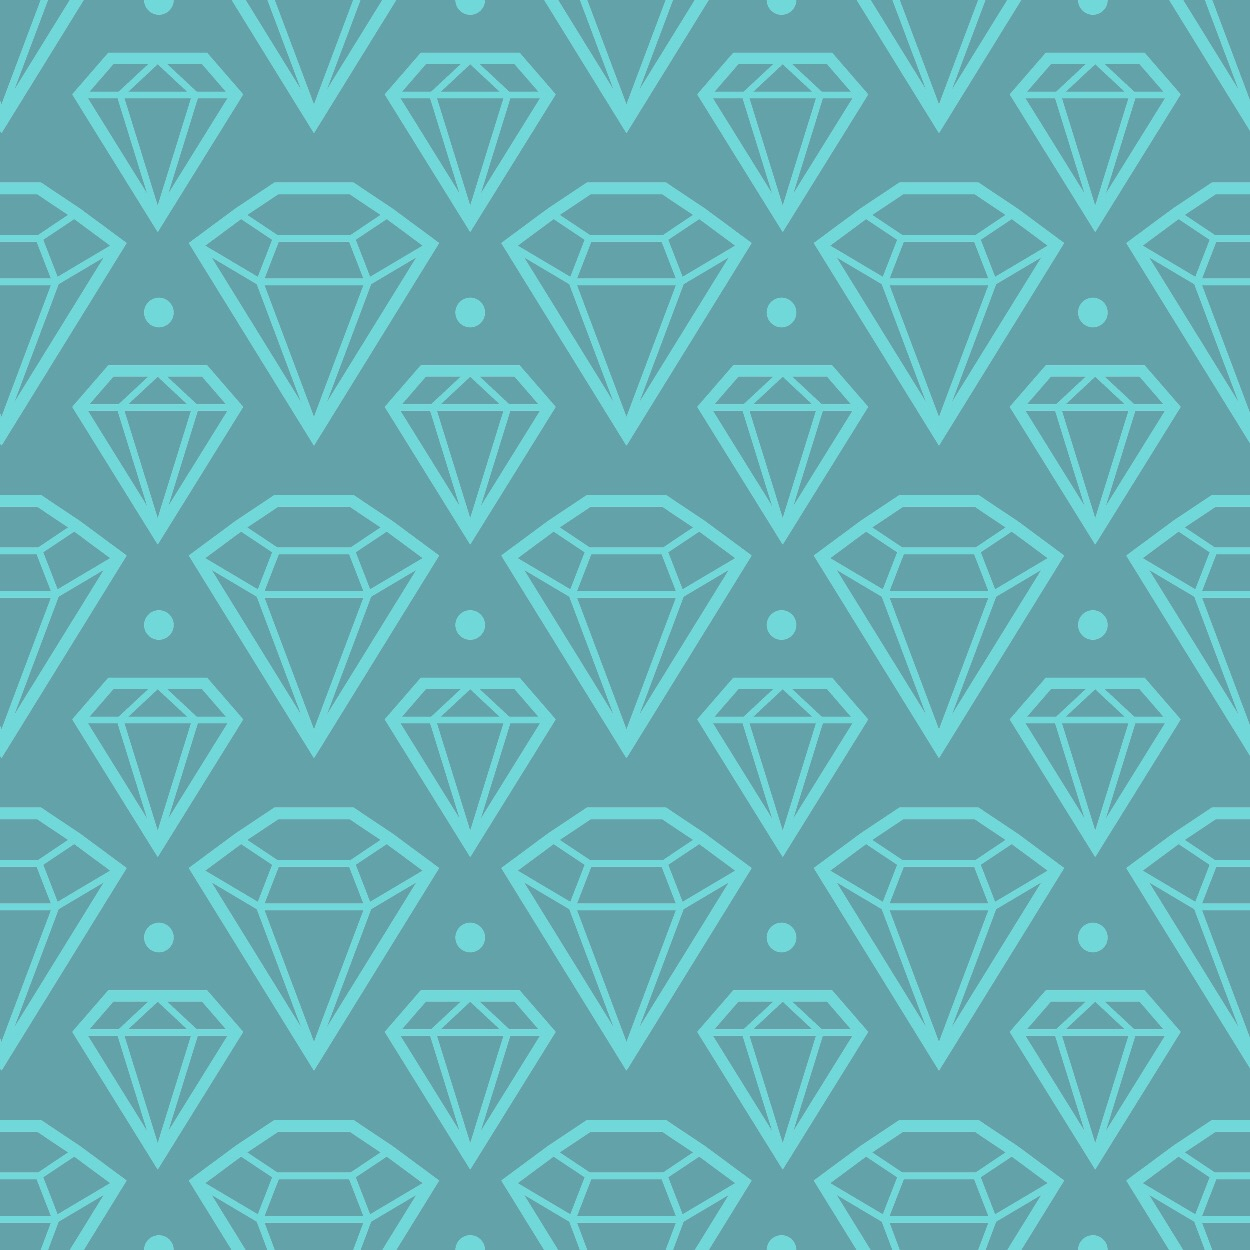 Background Wallpaper Diamond Blue Iphone Shapes Pattern 1250x1250 Wallpaper Teahub Io